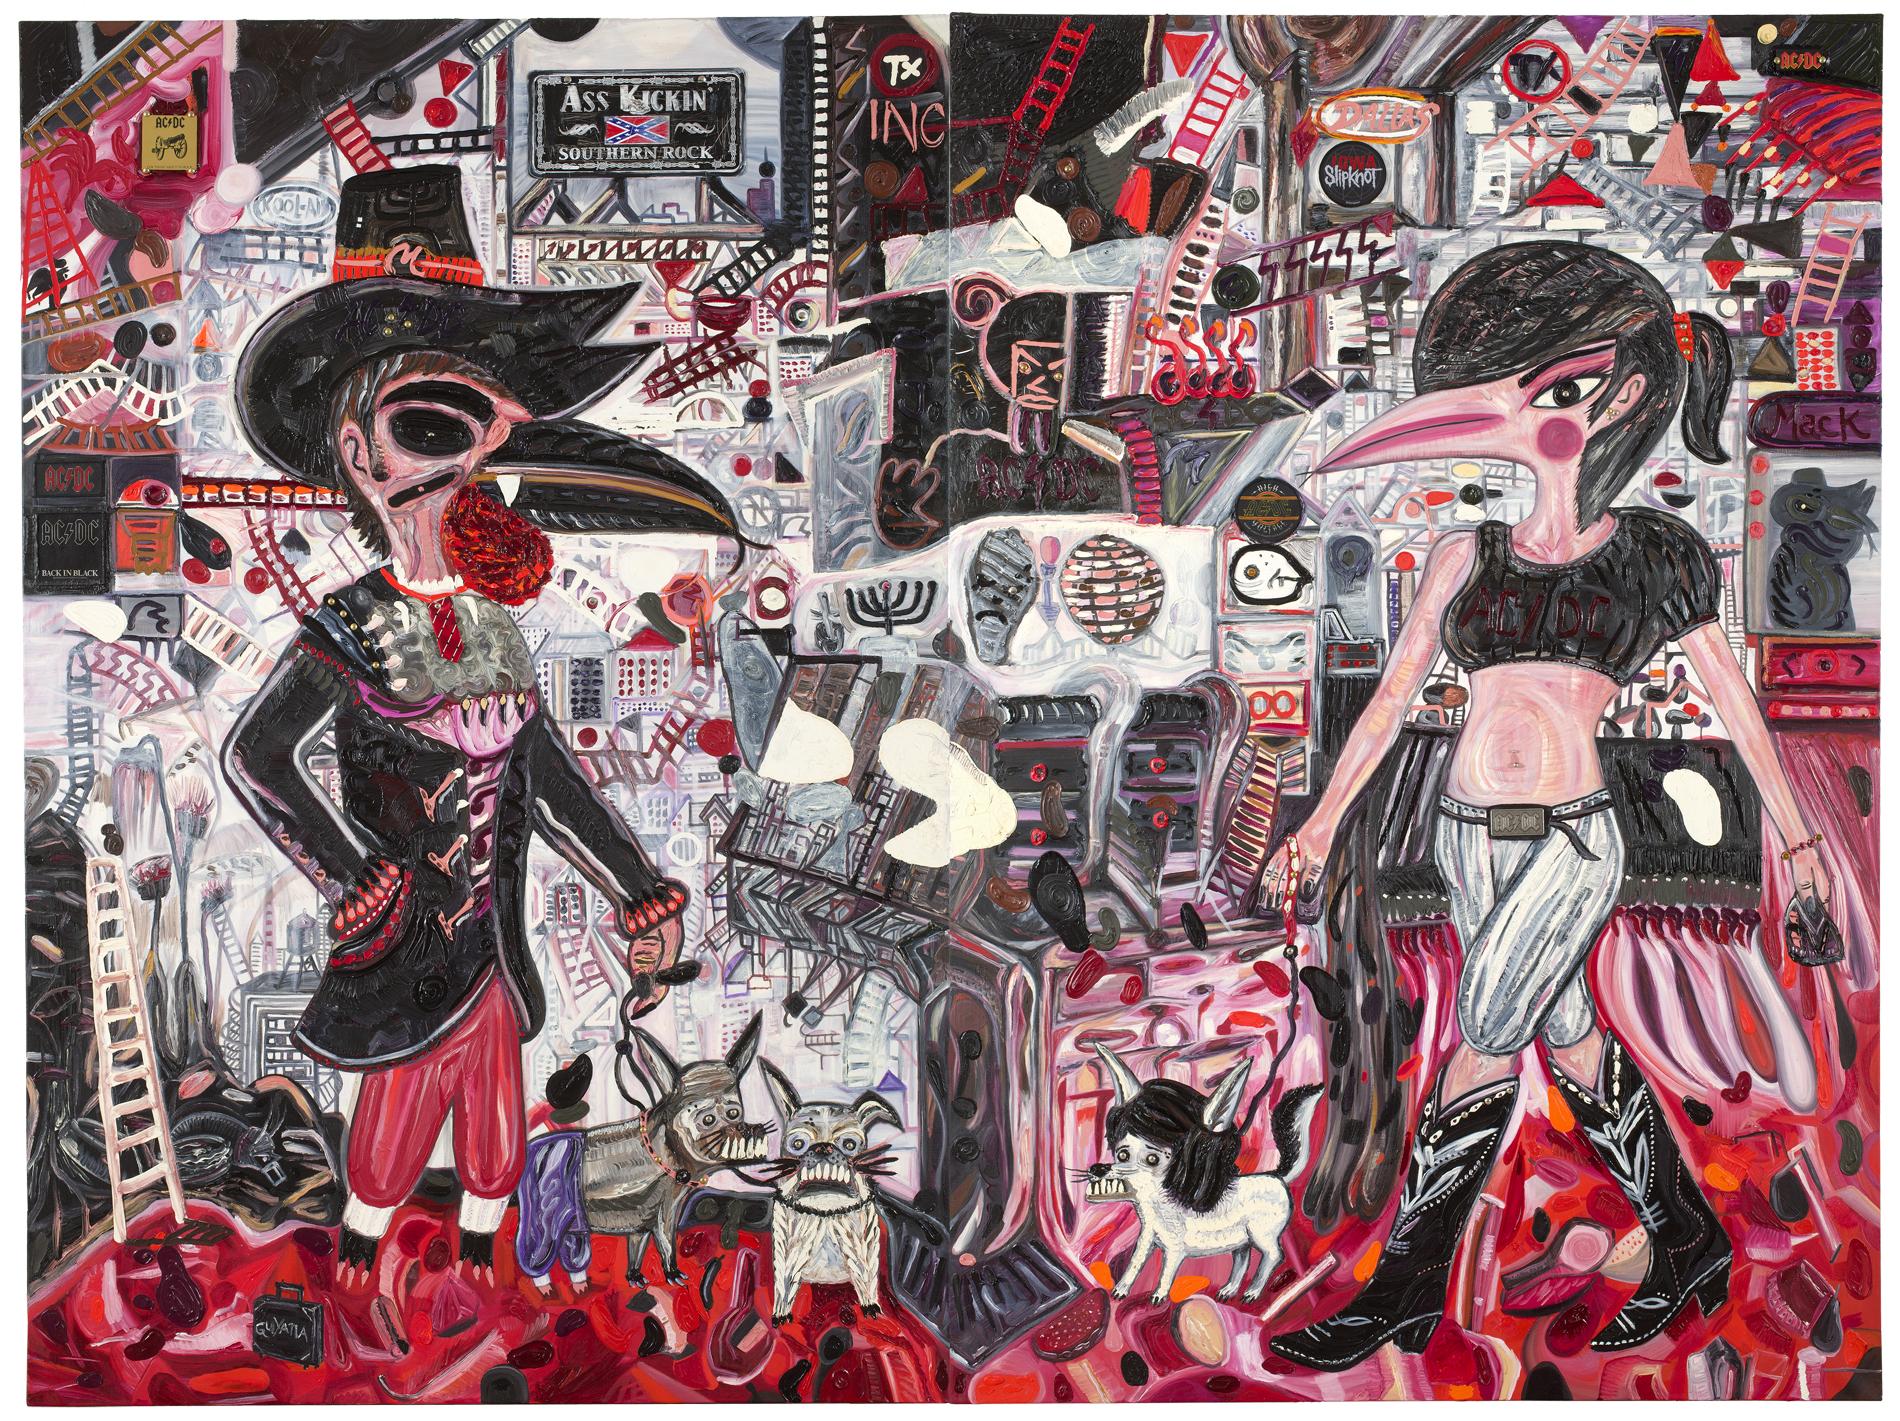 Abdul Vas. Rock ´N´ Roll. Cucarachero Dul Jewish, Laica & Patticcas Alcanhizana, 2007 (diptych)